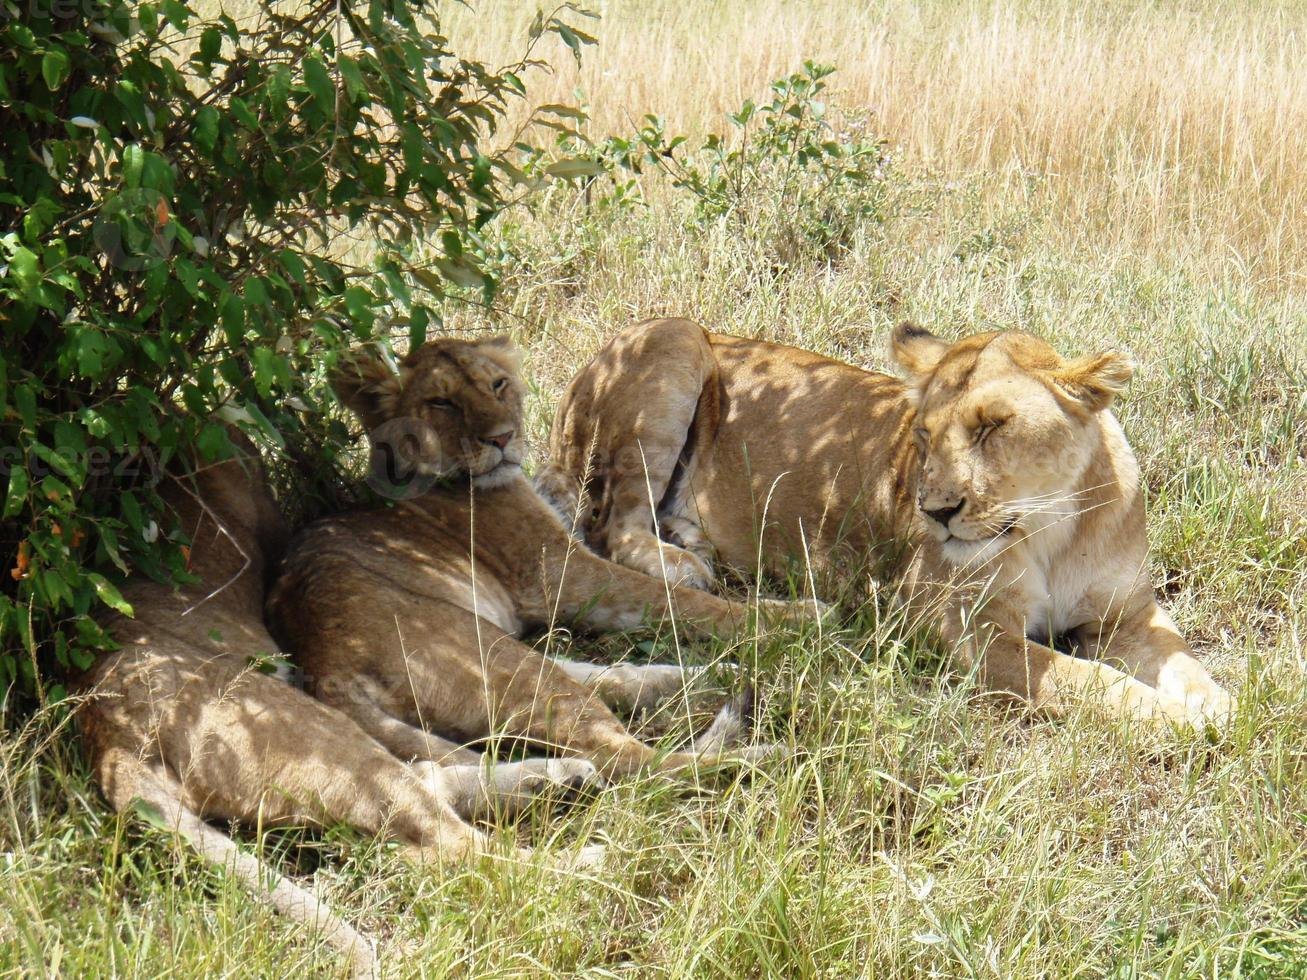 Löwen im goldenen Gras der Masai Mara Kenia Afrika foto